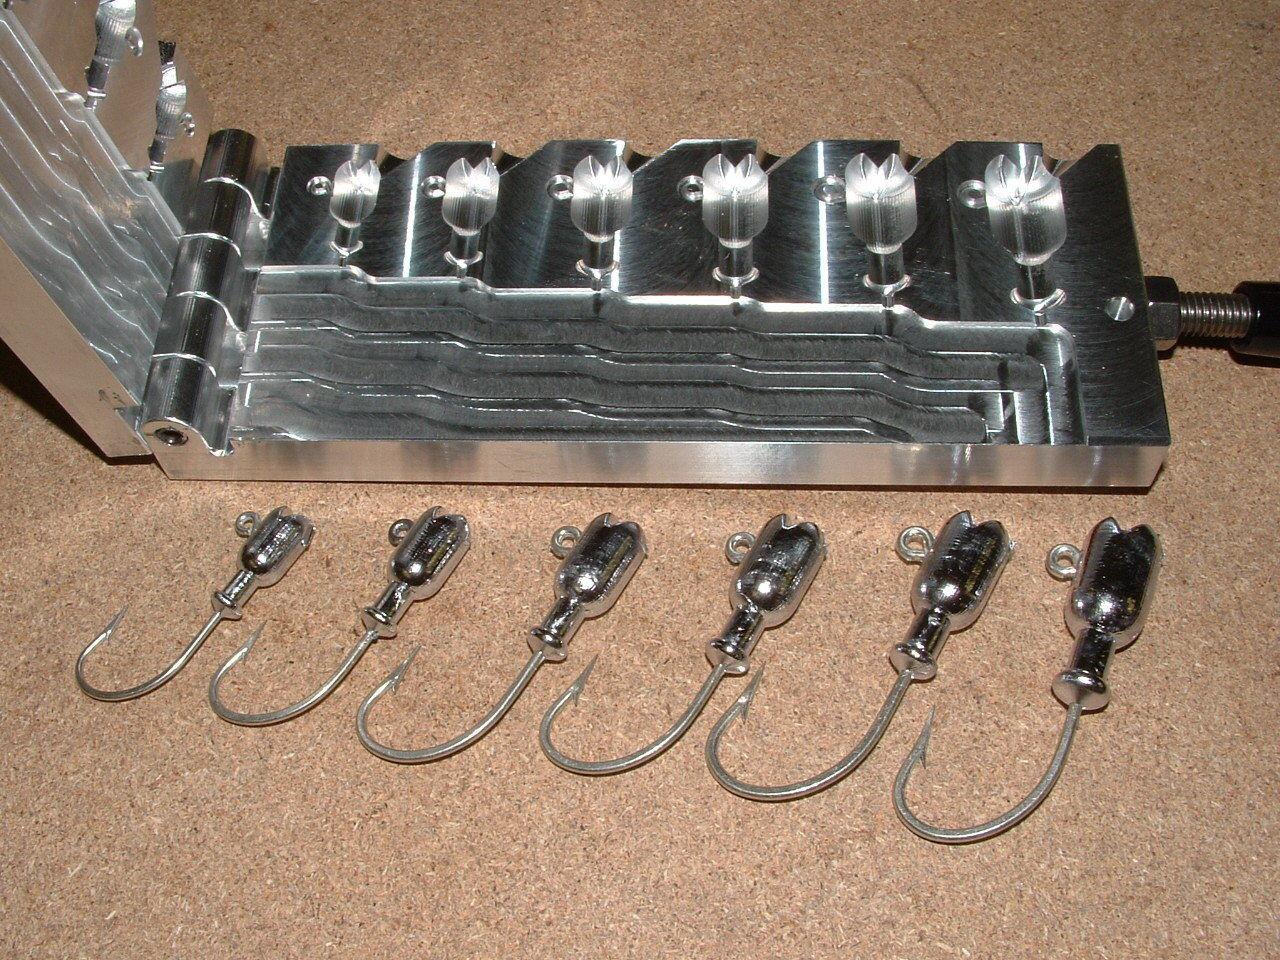 Saltwater Rubylips -2 Jig mold 1 2,3  4,1,1.25,1.5,2oz CNC Aluminum  first-class service